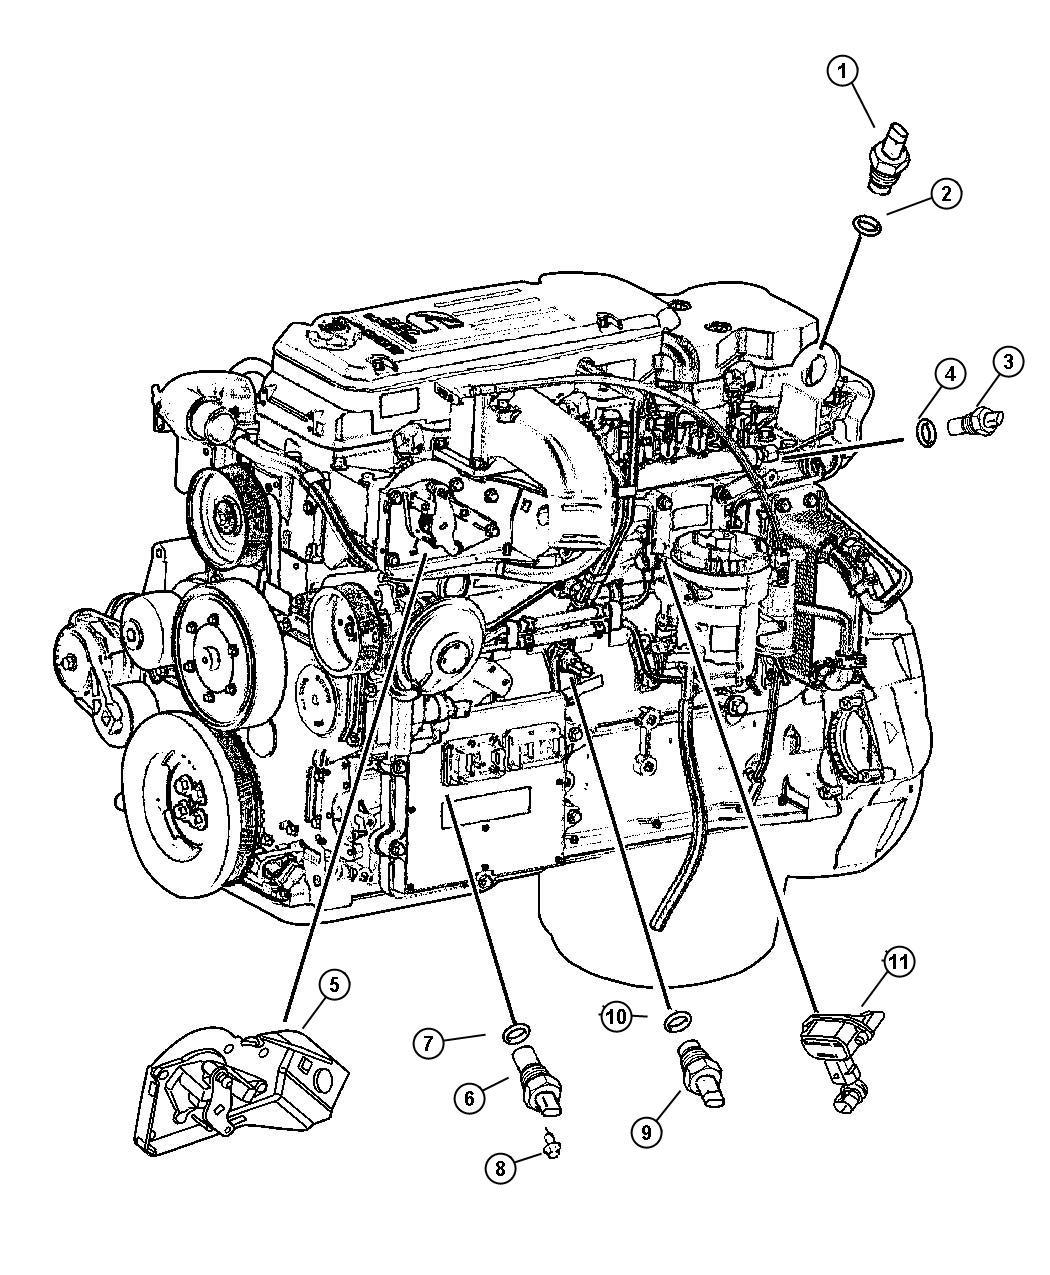 2007 Chrysler Crossfire Sensor. Air temperature. Diesel